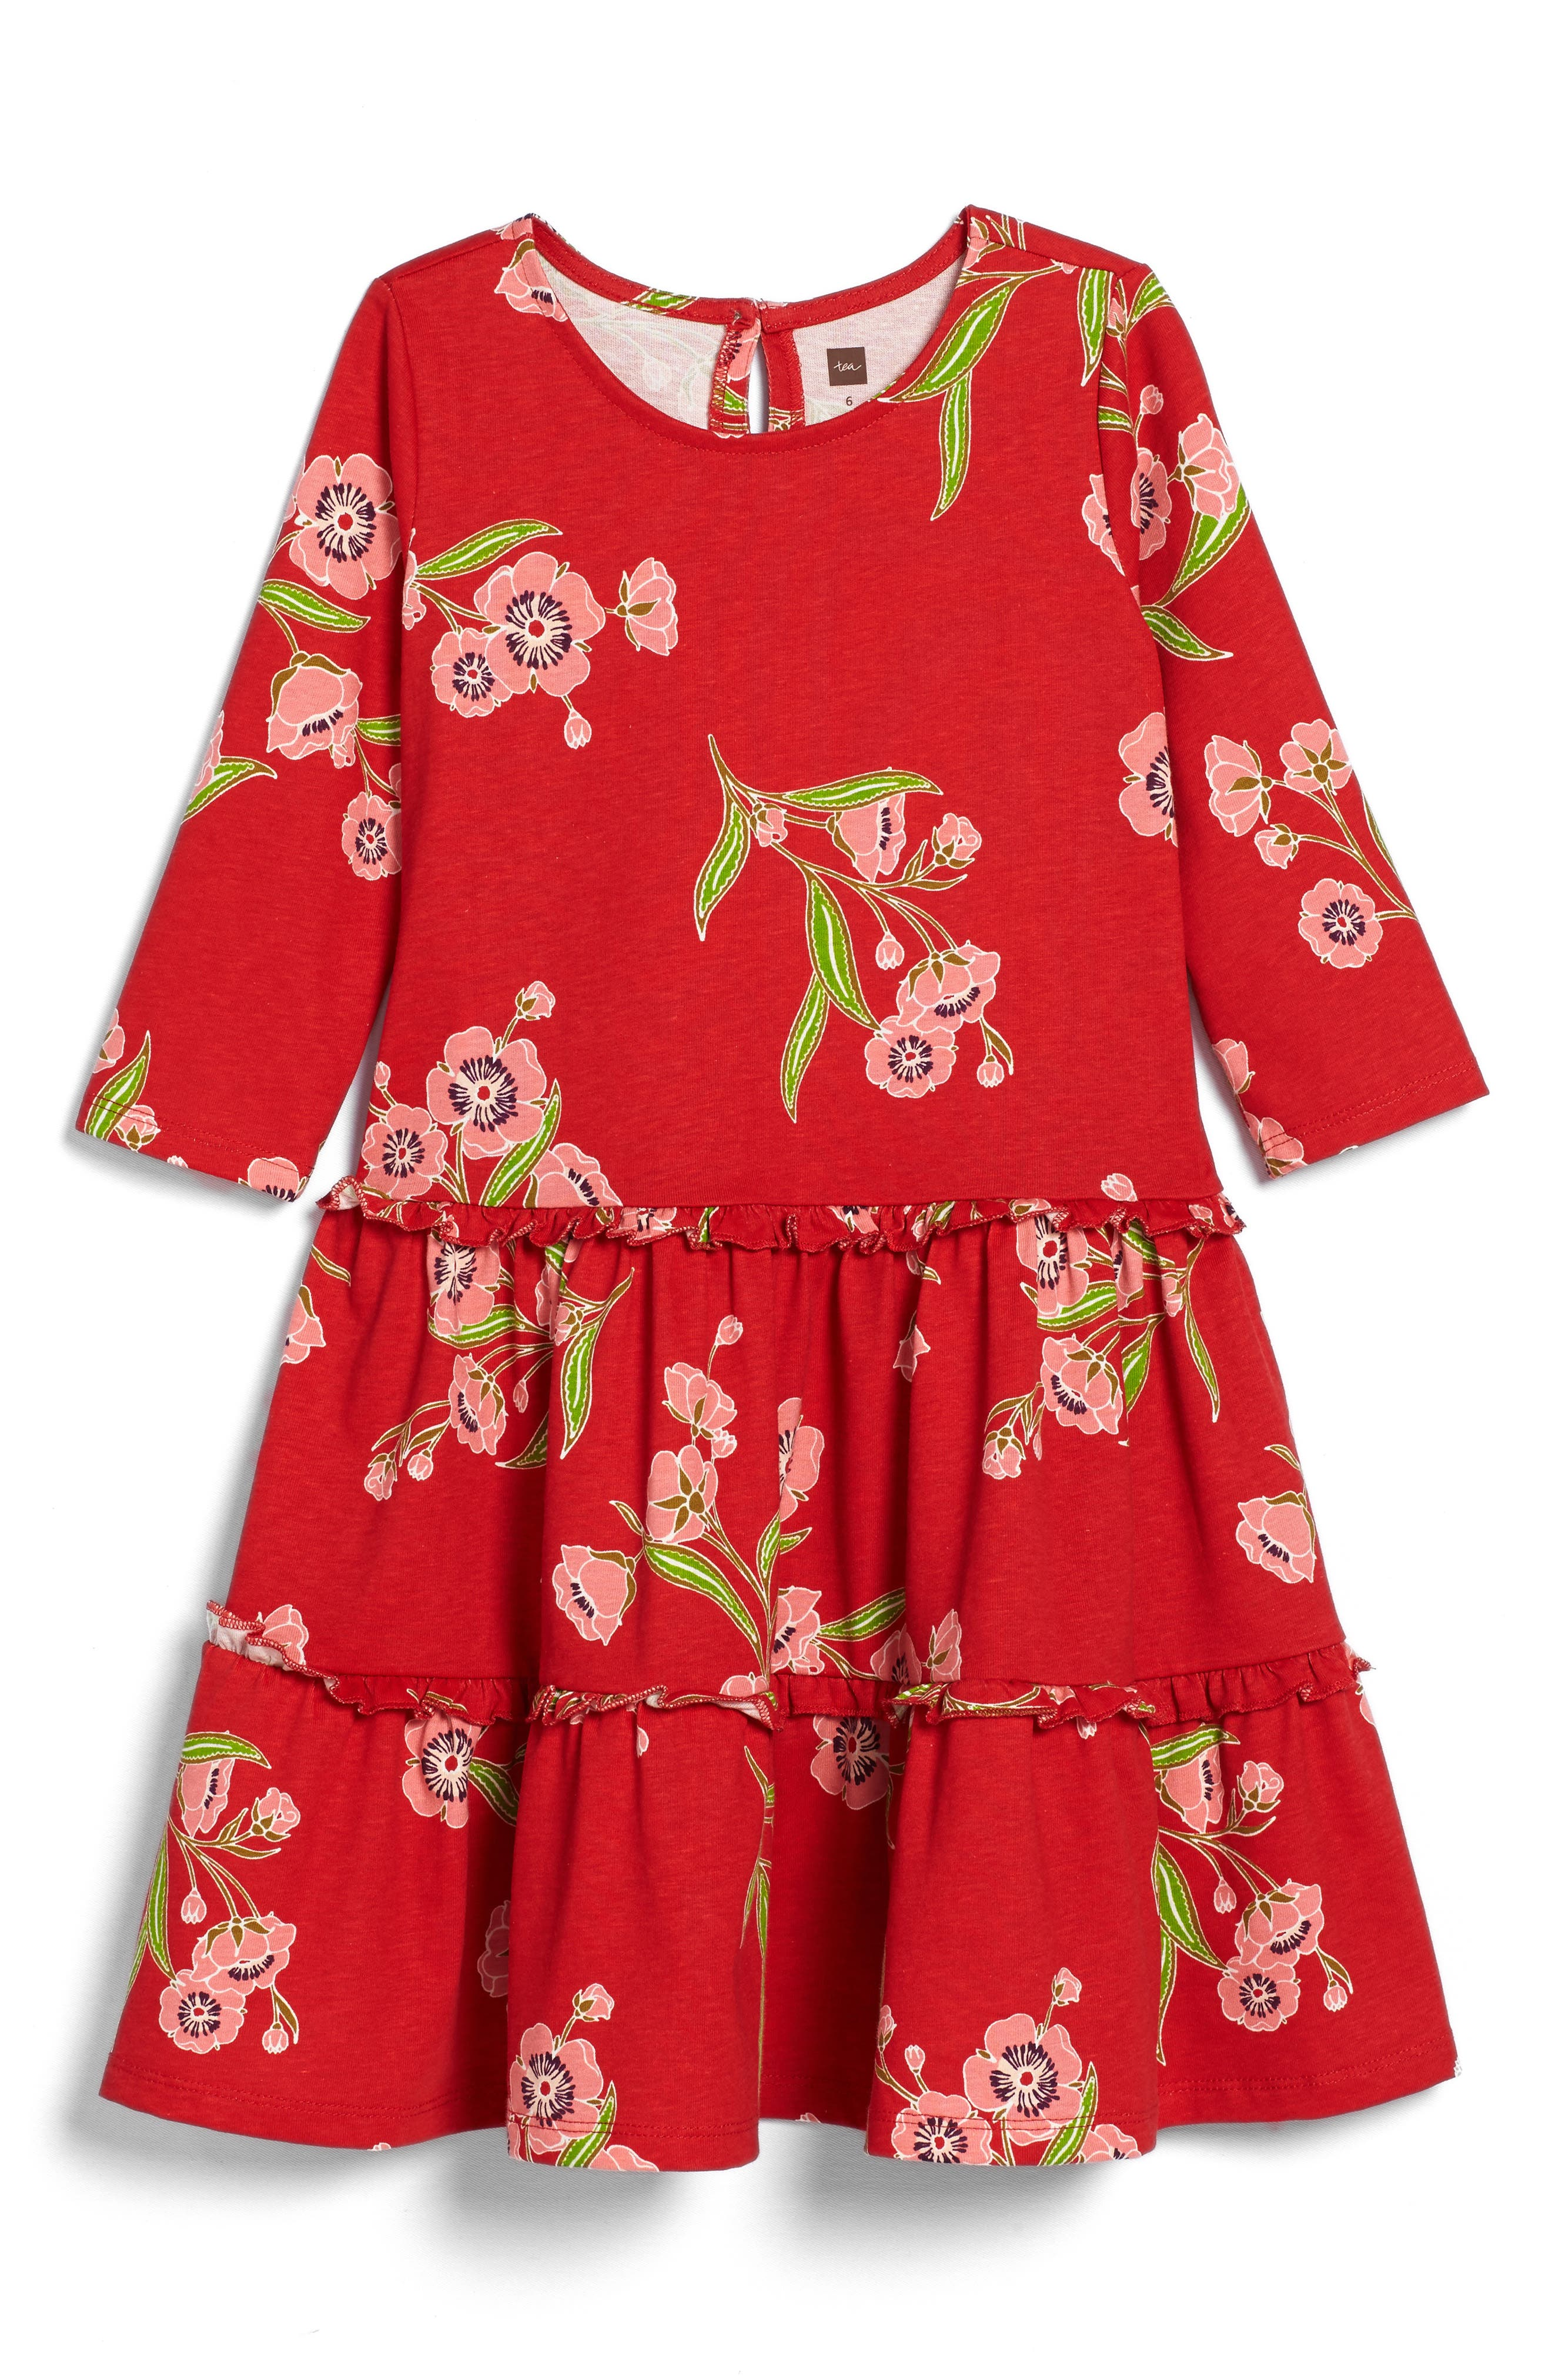 Main Image - Tea Collection Rowan Floral Print Tiered Dress (Toddler Girls, Little Girls & Big Girls)